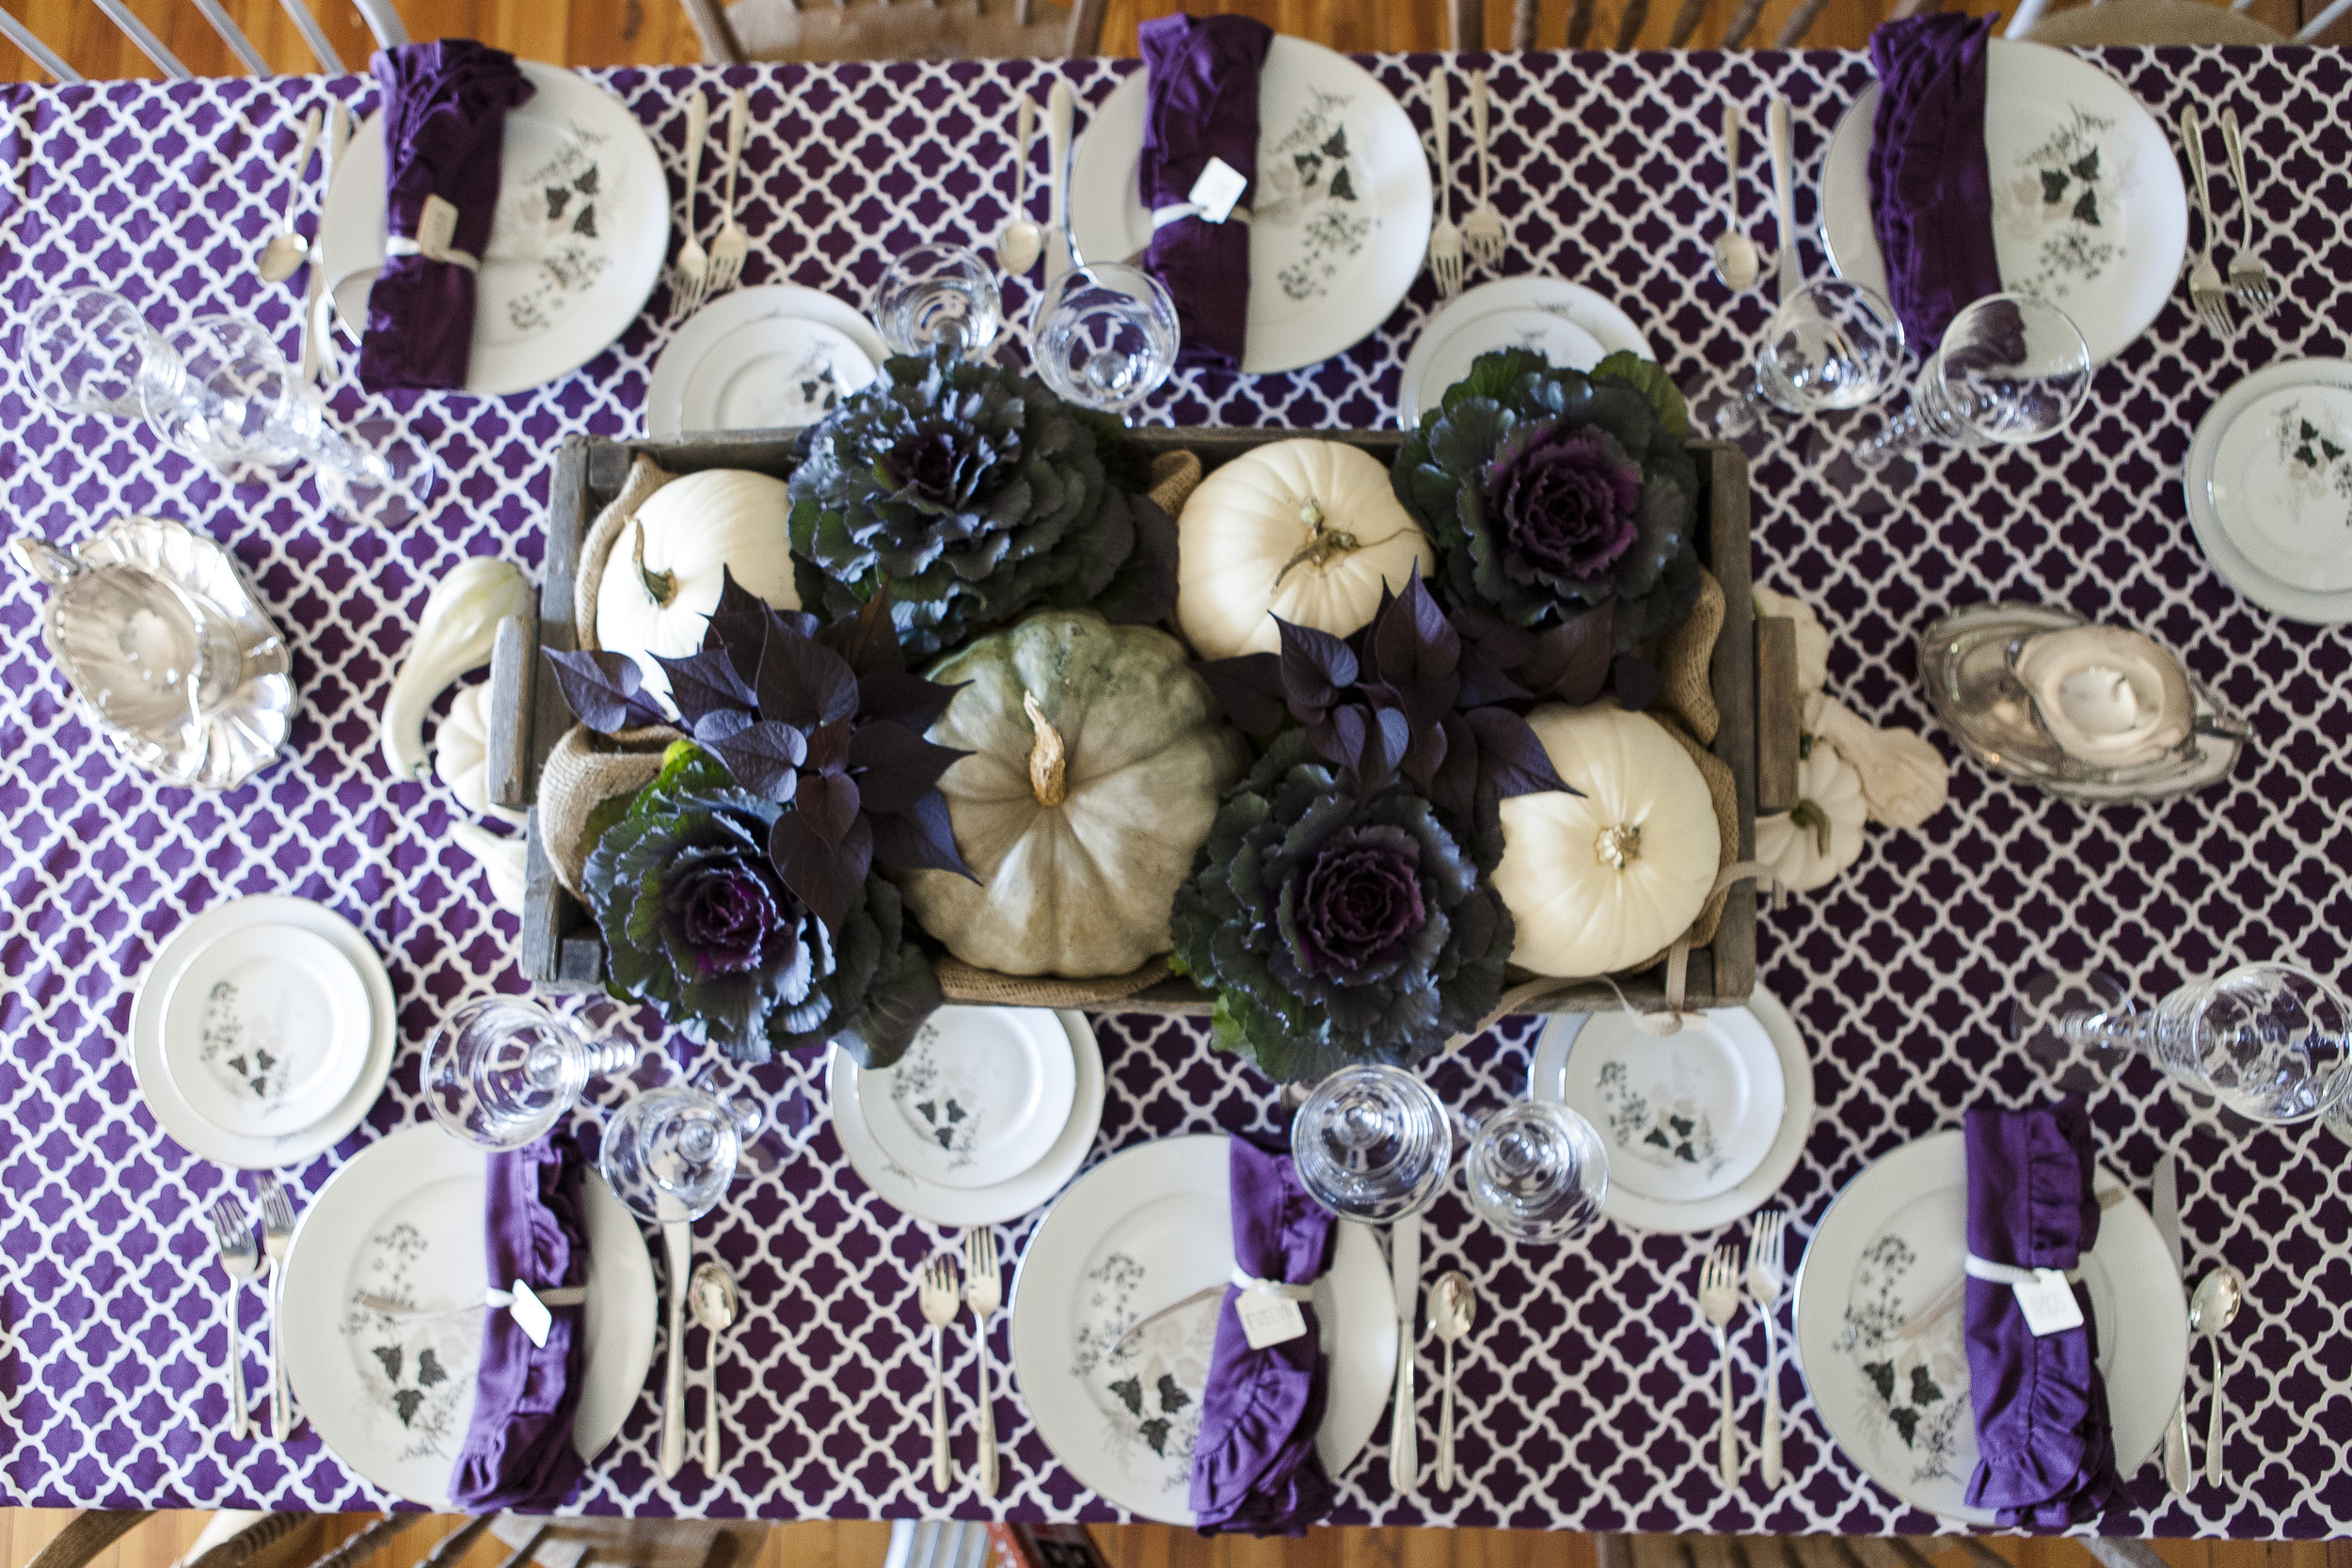 Purple cotton tablecloth